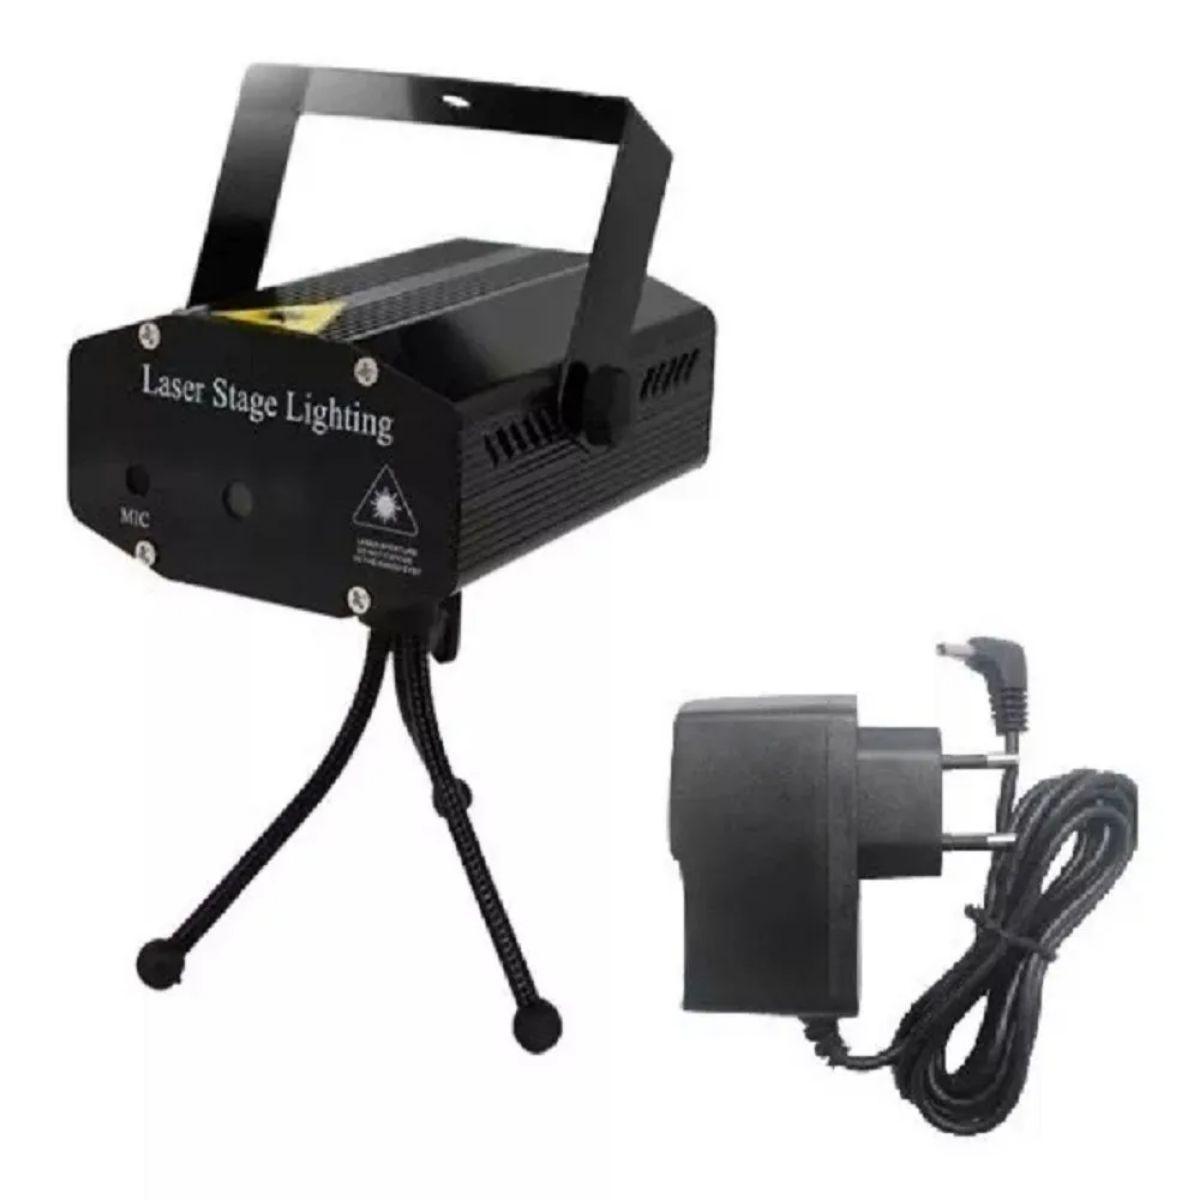 Mini Laser Projetor Holográfico Stage Lighting Preto E Azul - SD-107